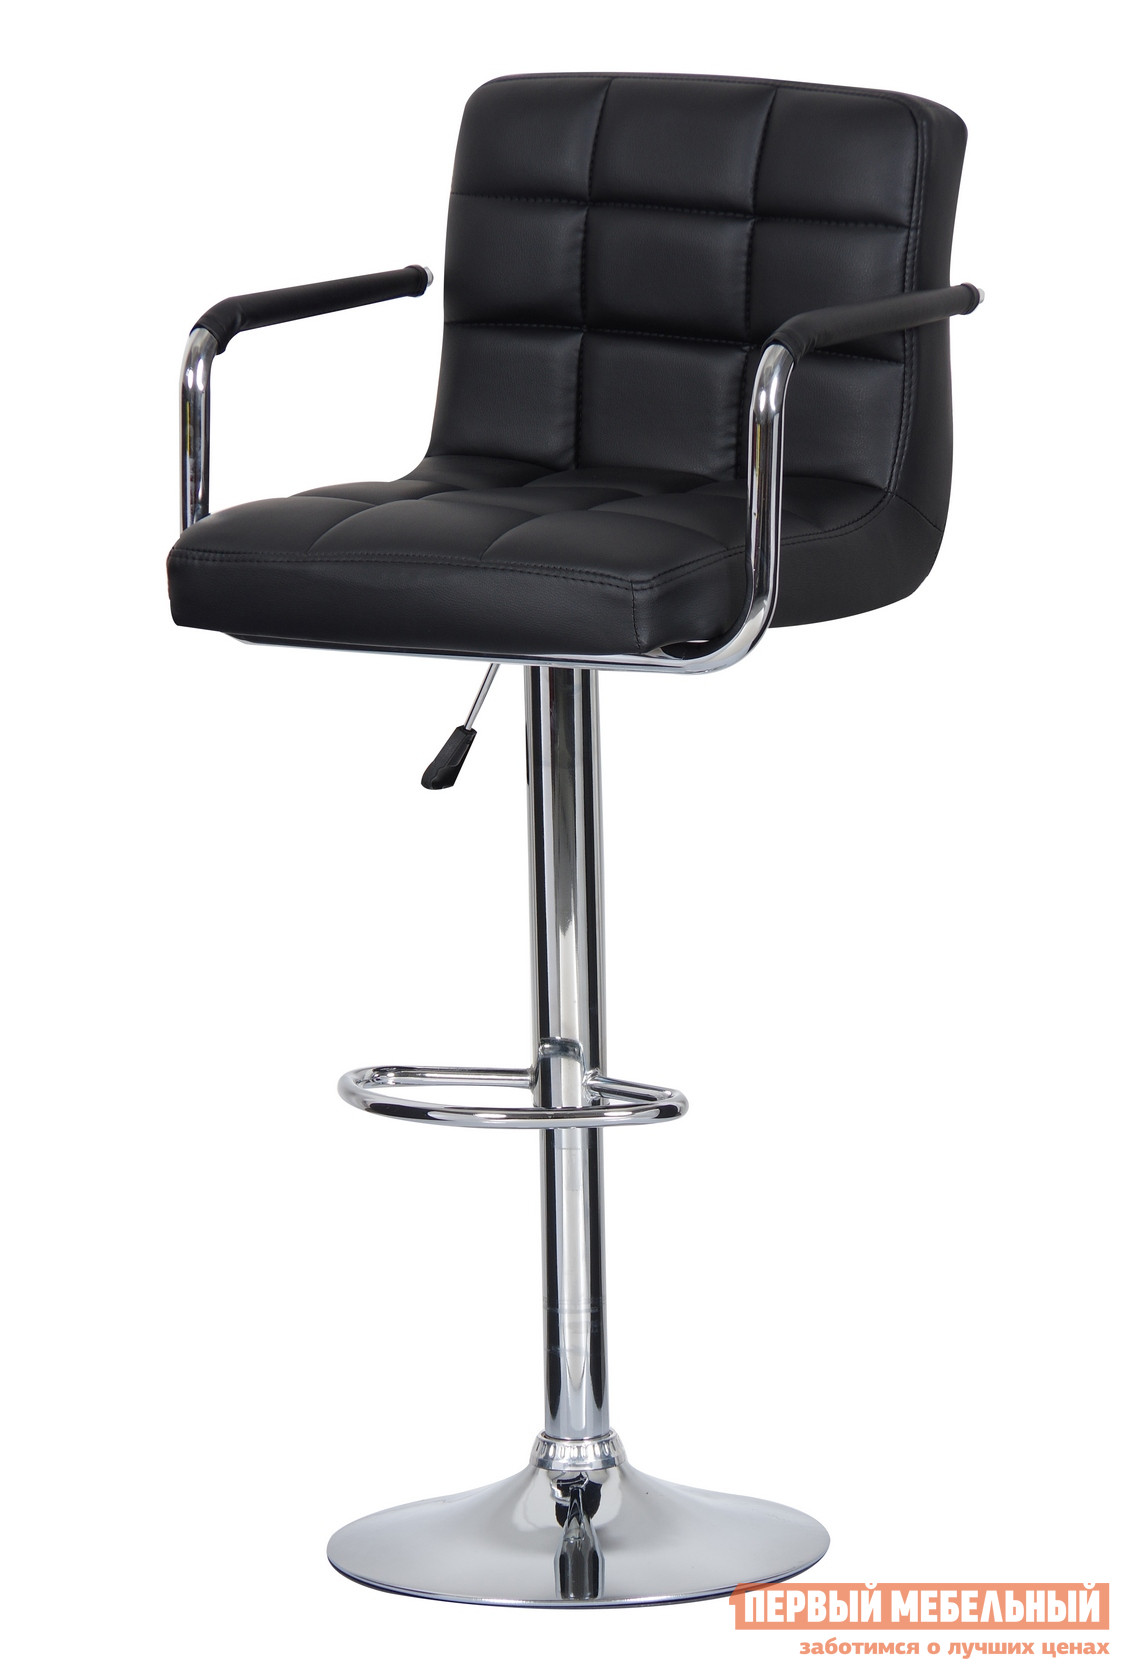 Барный стул Паоли Kruger Arm T808F-1 Black кожзам